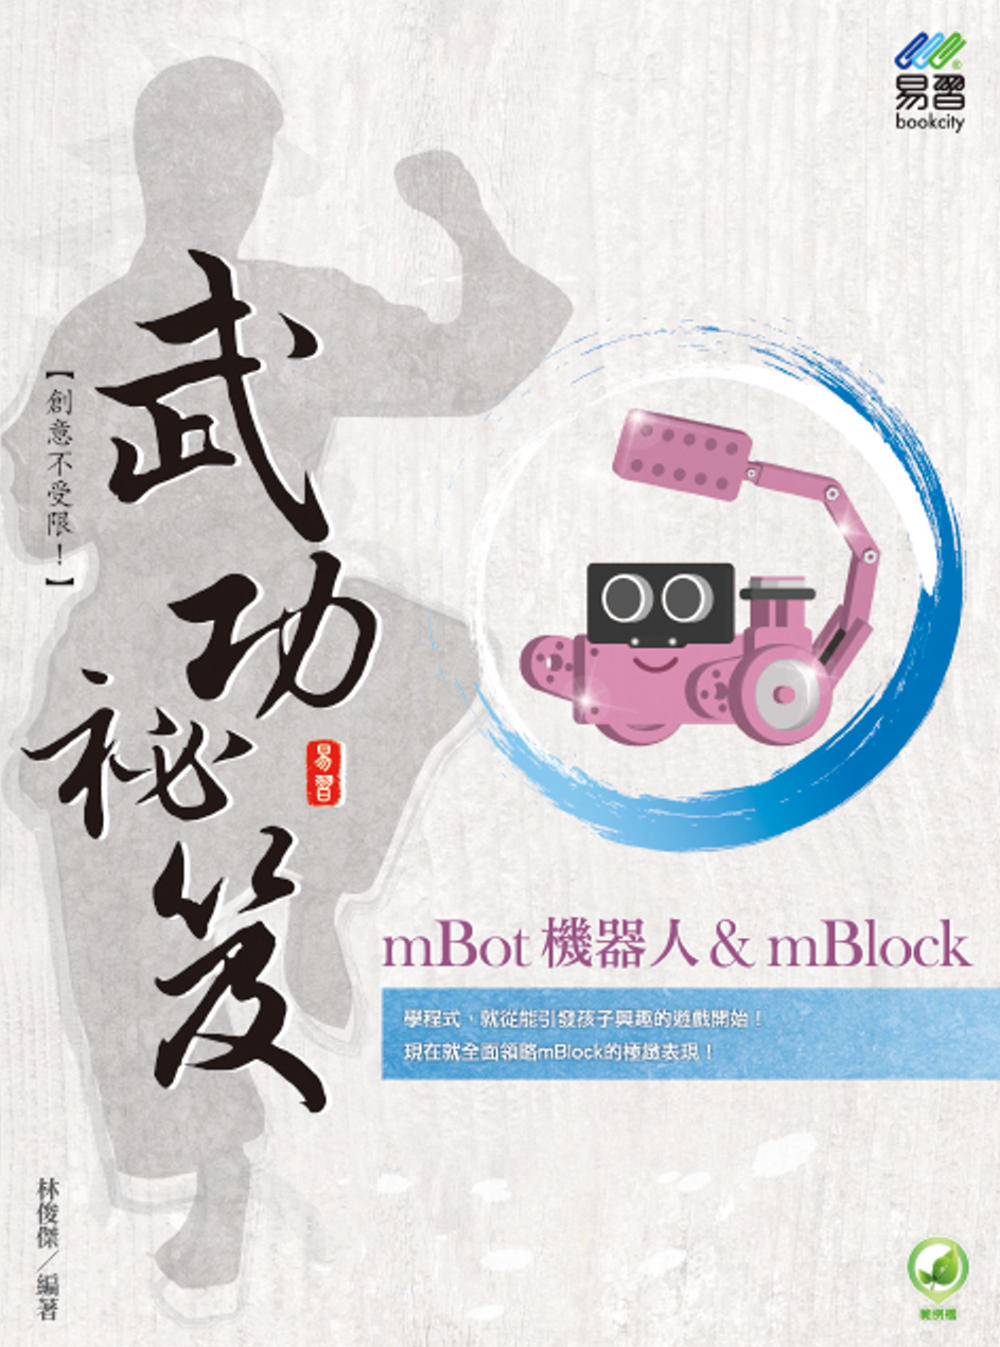 mBot機器人& mBlock...